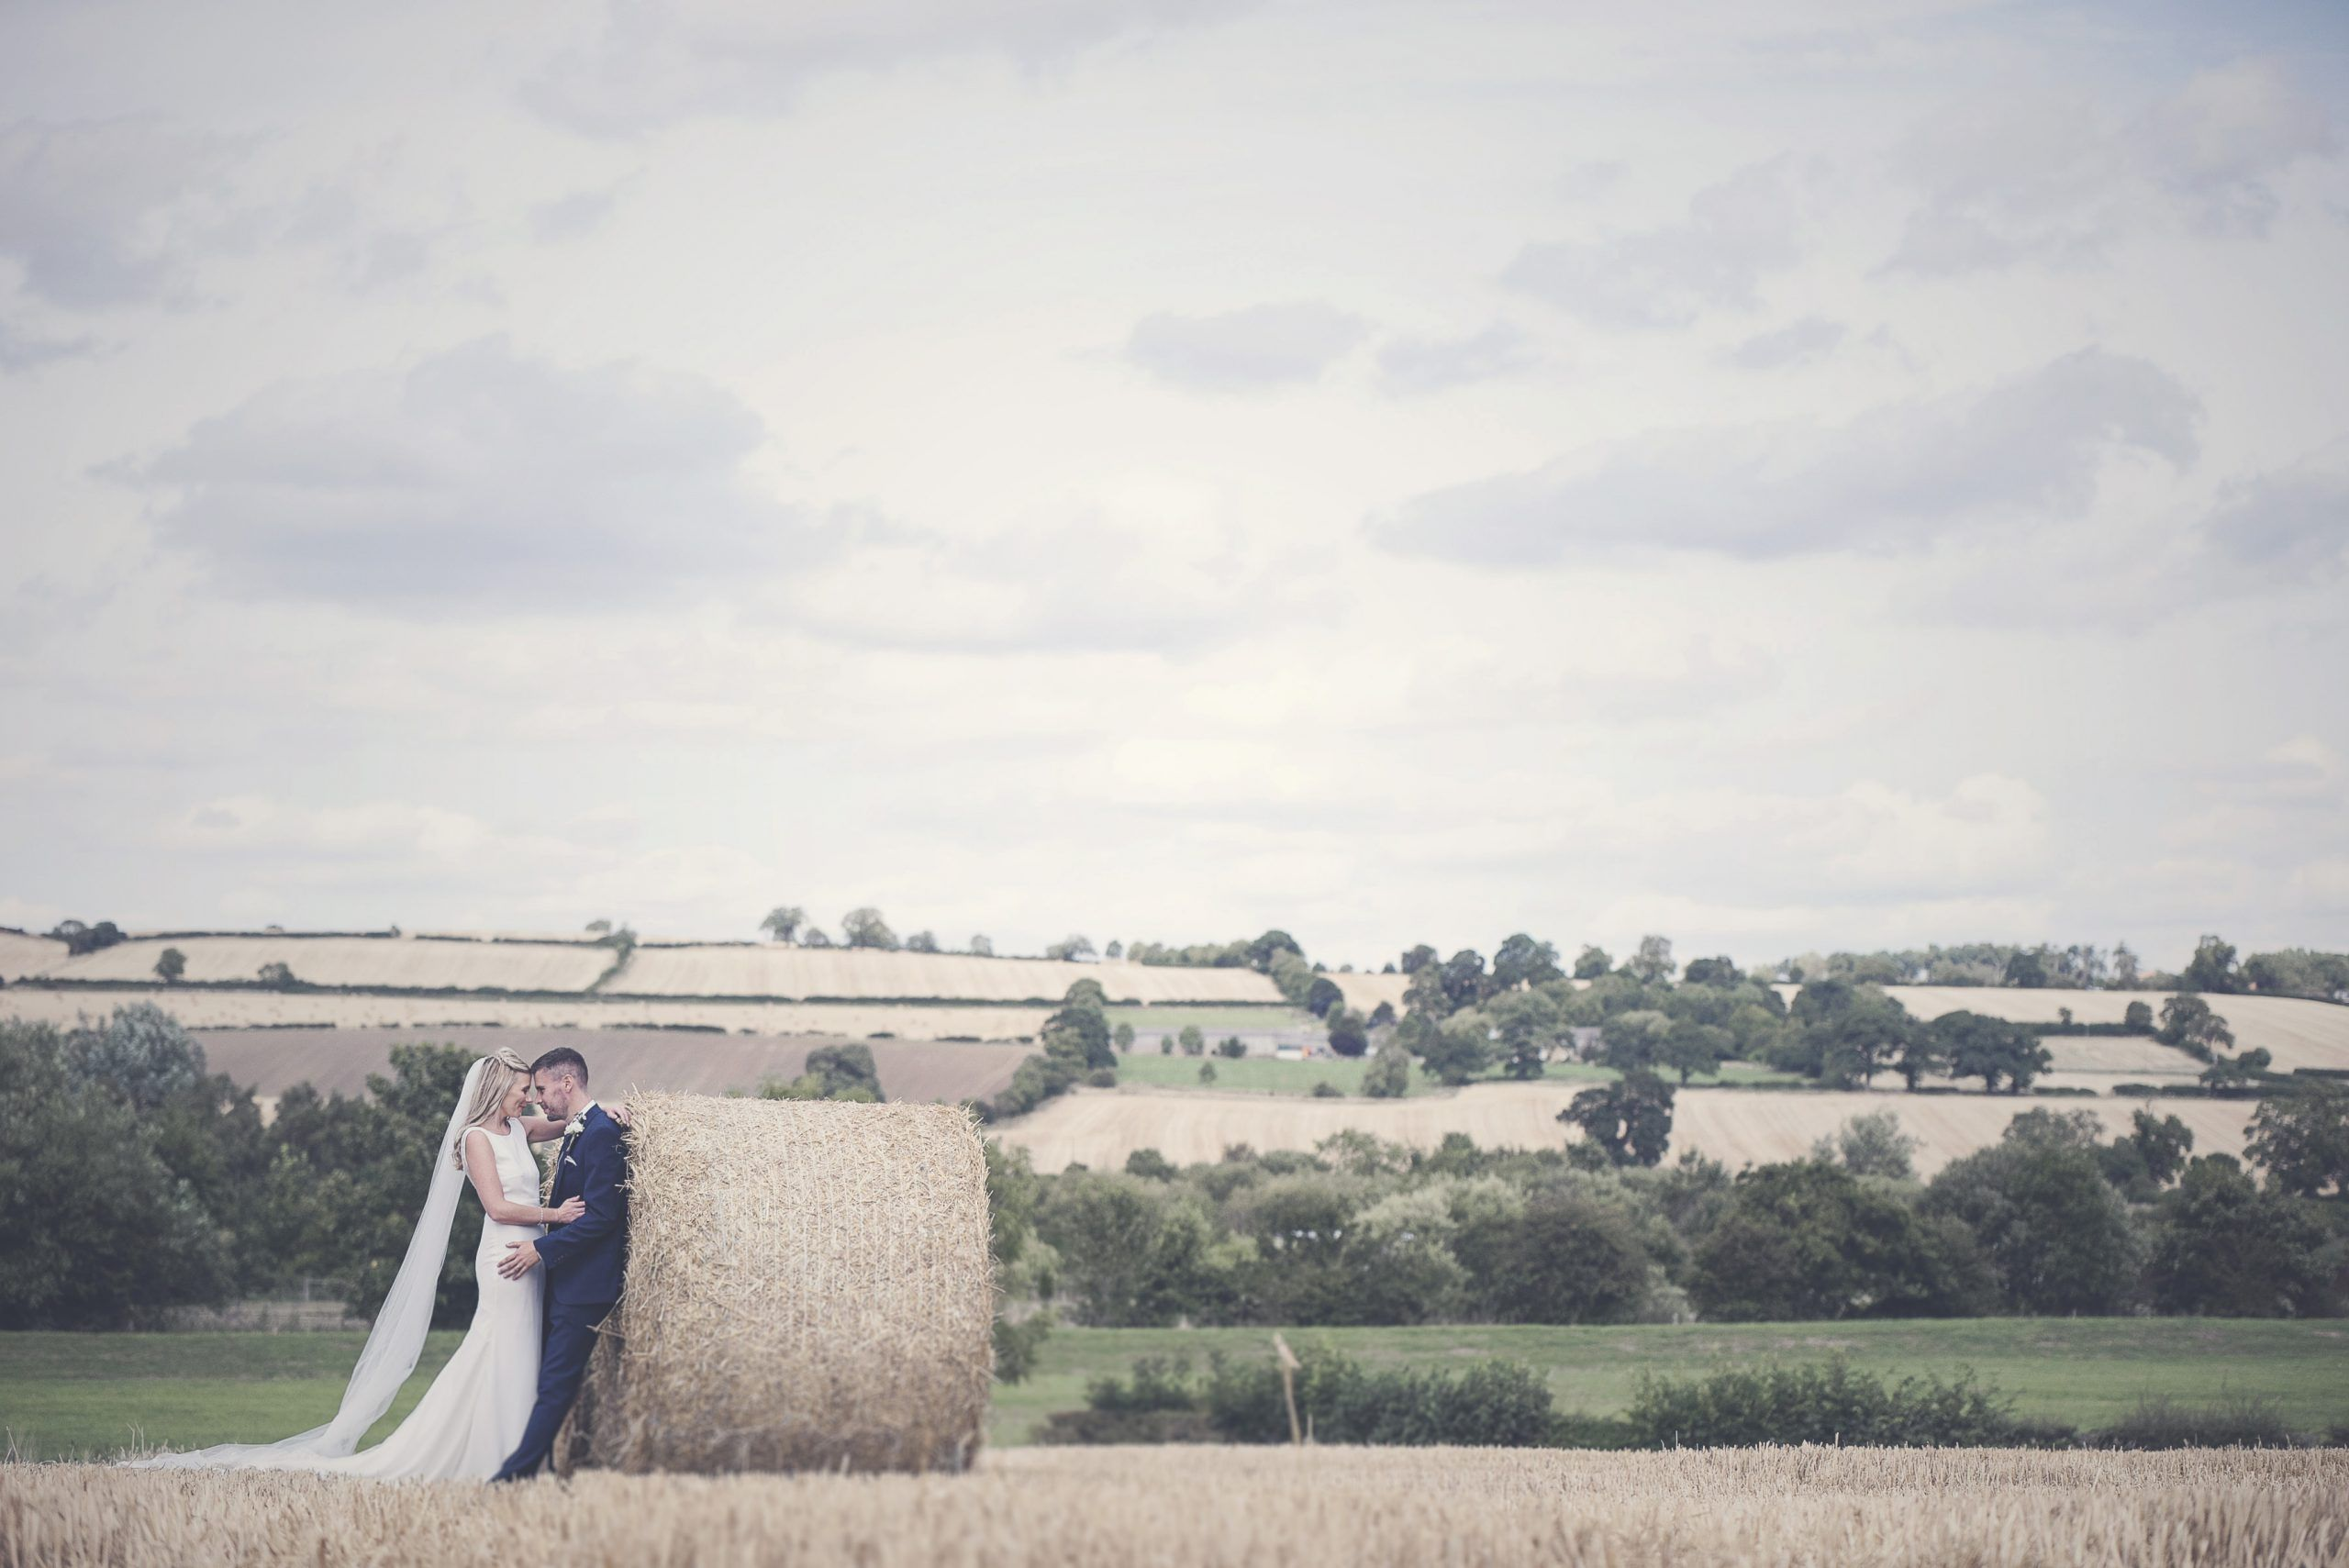 Yorkshire Wedding Barn - North Yorkshire Wedding Venue in ...